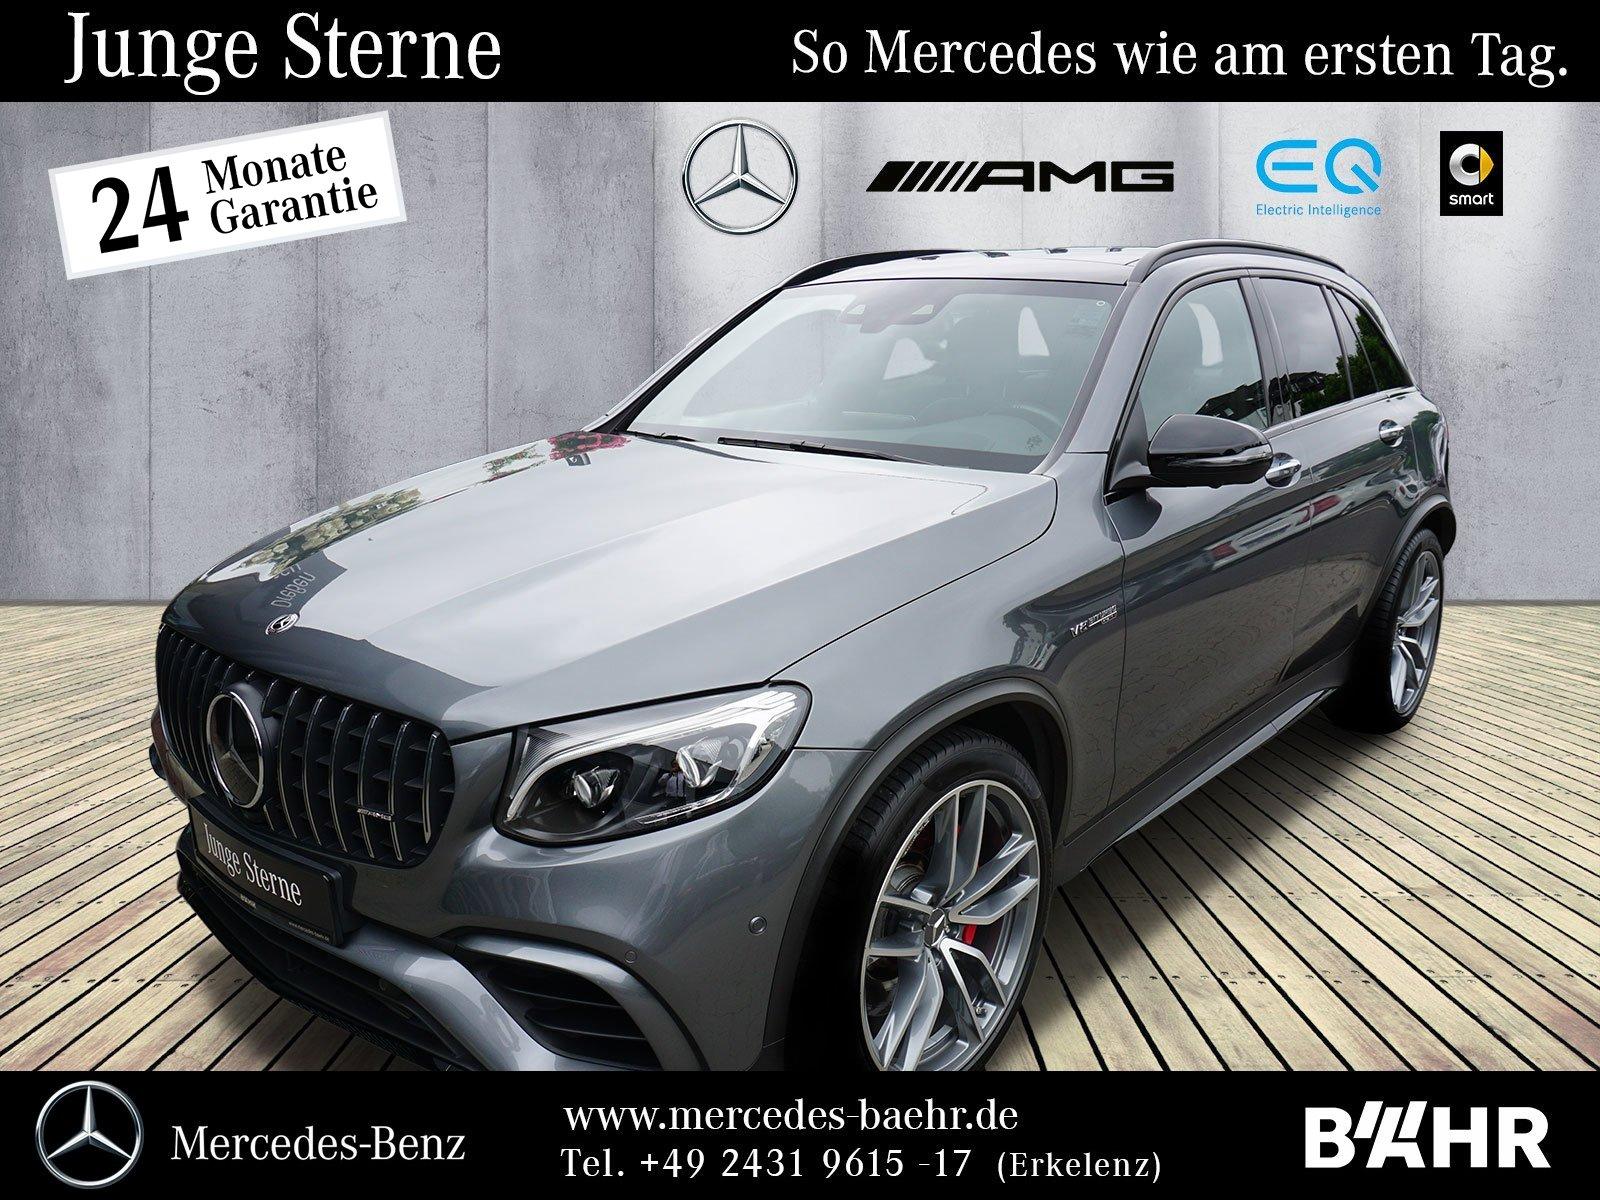 Mercedes-Benz Mercedes-AMG GLC 63 S 4MATIC+ COMAND APS/Styling, Jahr 2018, Benzin